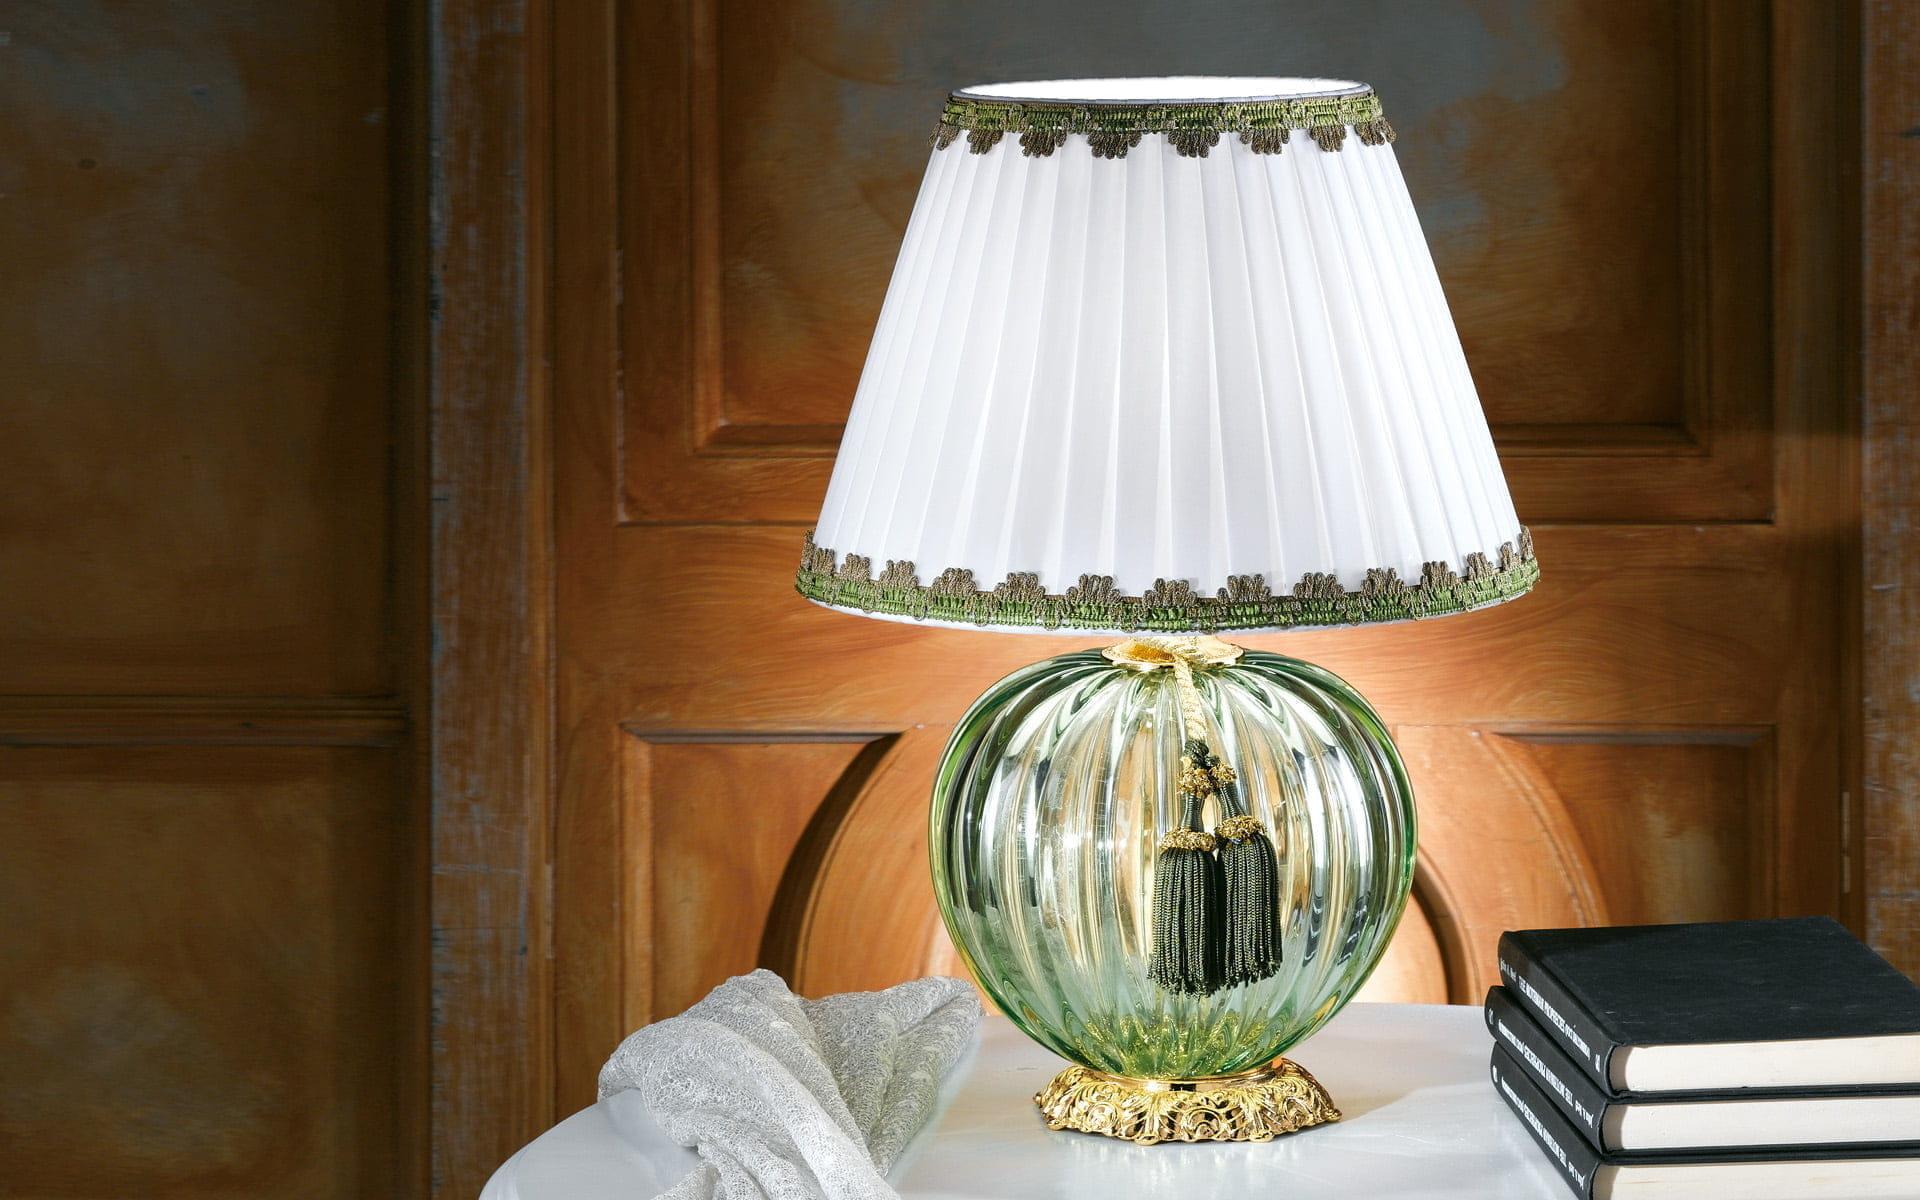 Зеленая настольная лампа своими руками 85